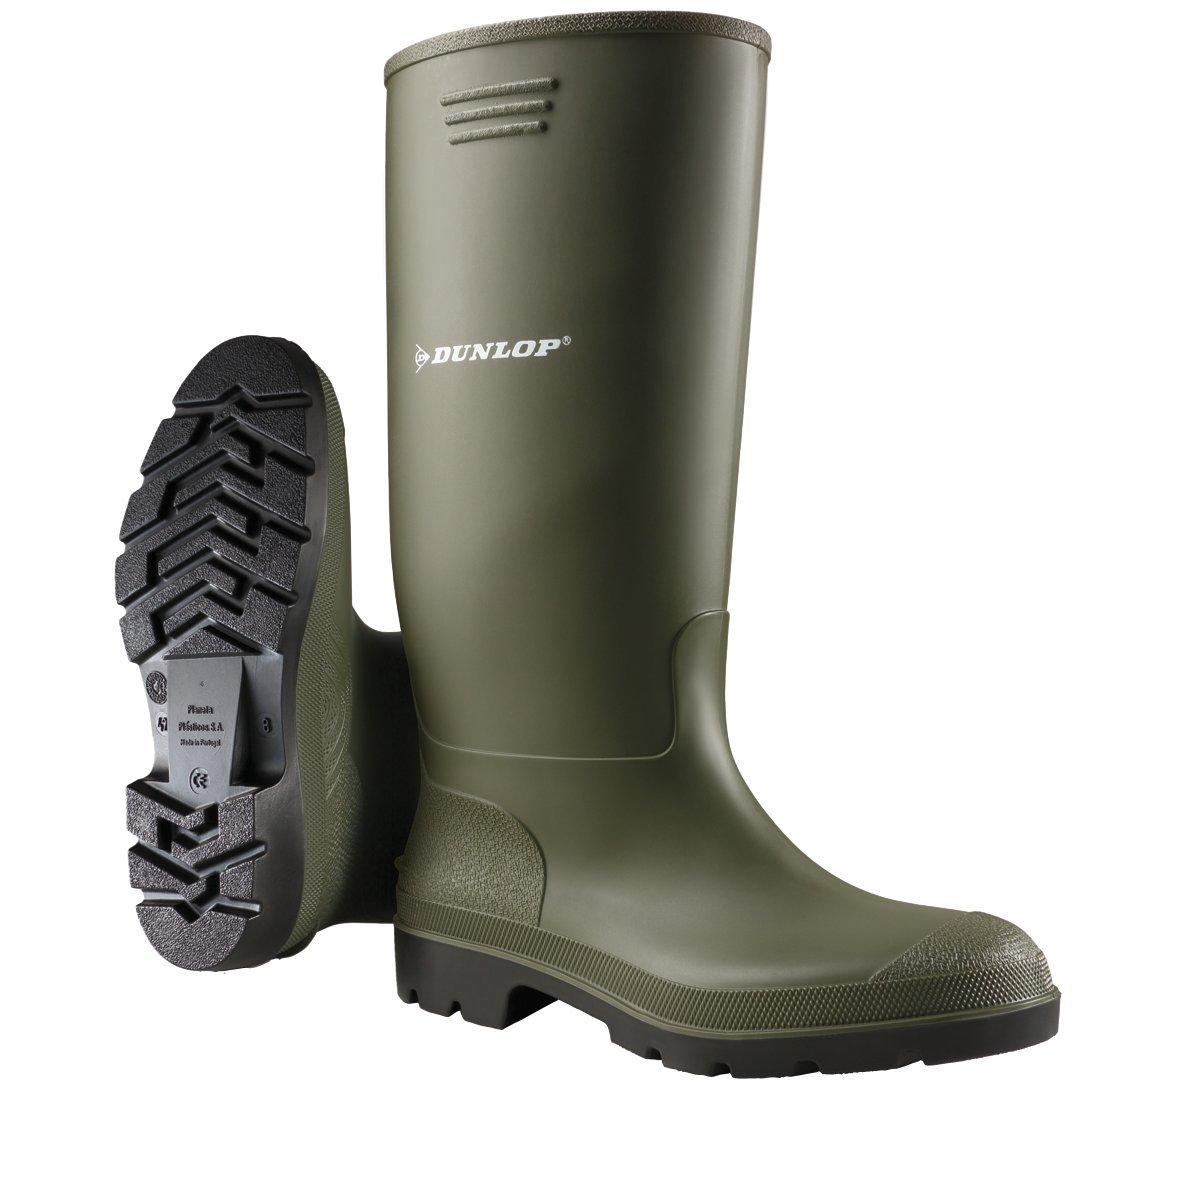 Dunlop Protective Footwear (DUO18) Dunlop Pricemastor, Botas de Agua Unisex Adulto, Green, 45 EU